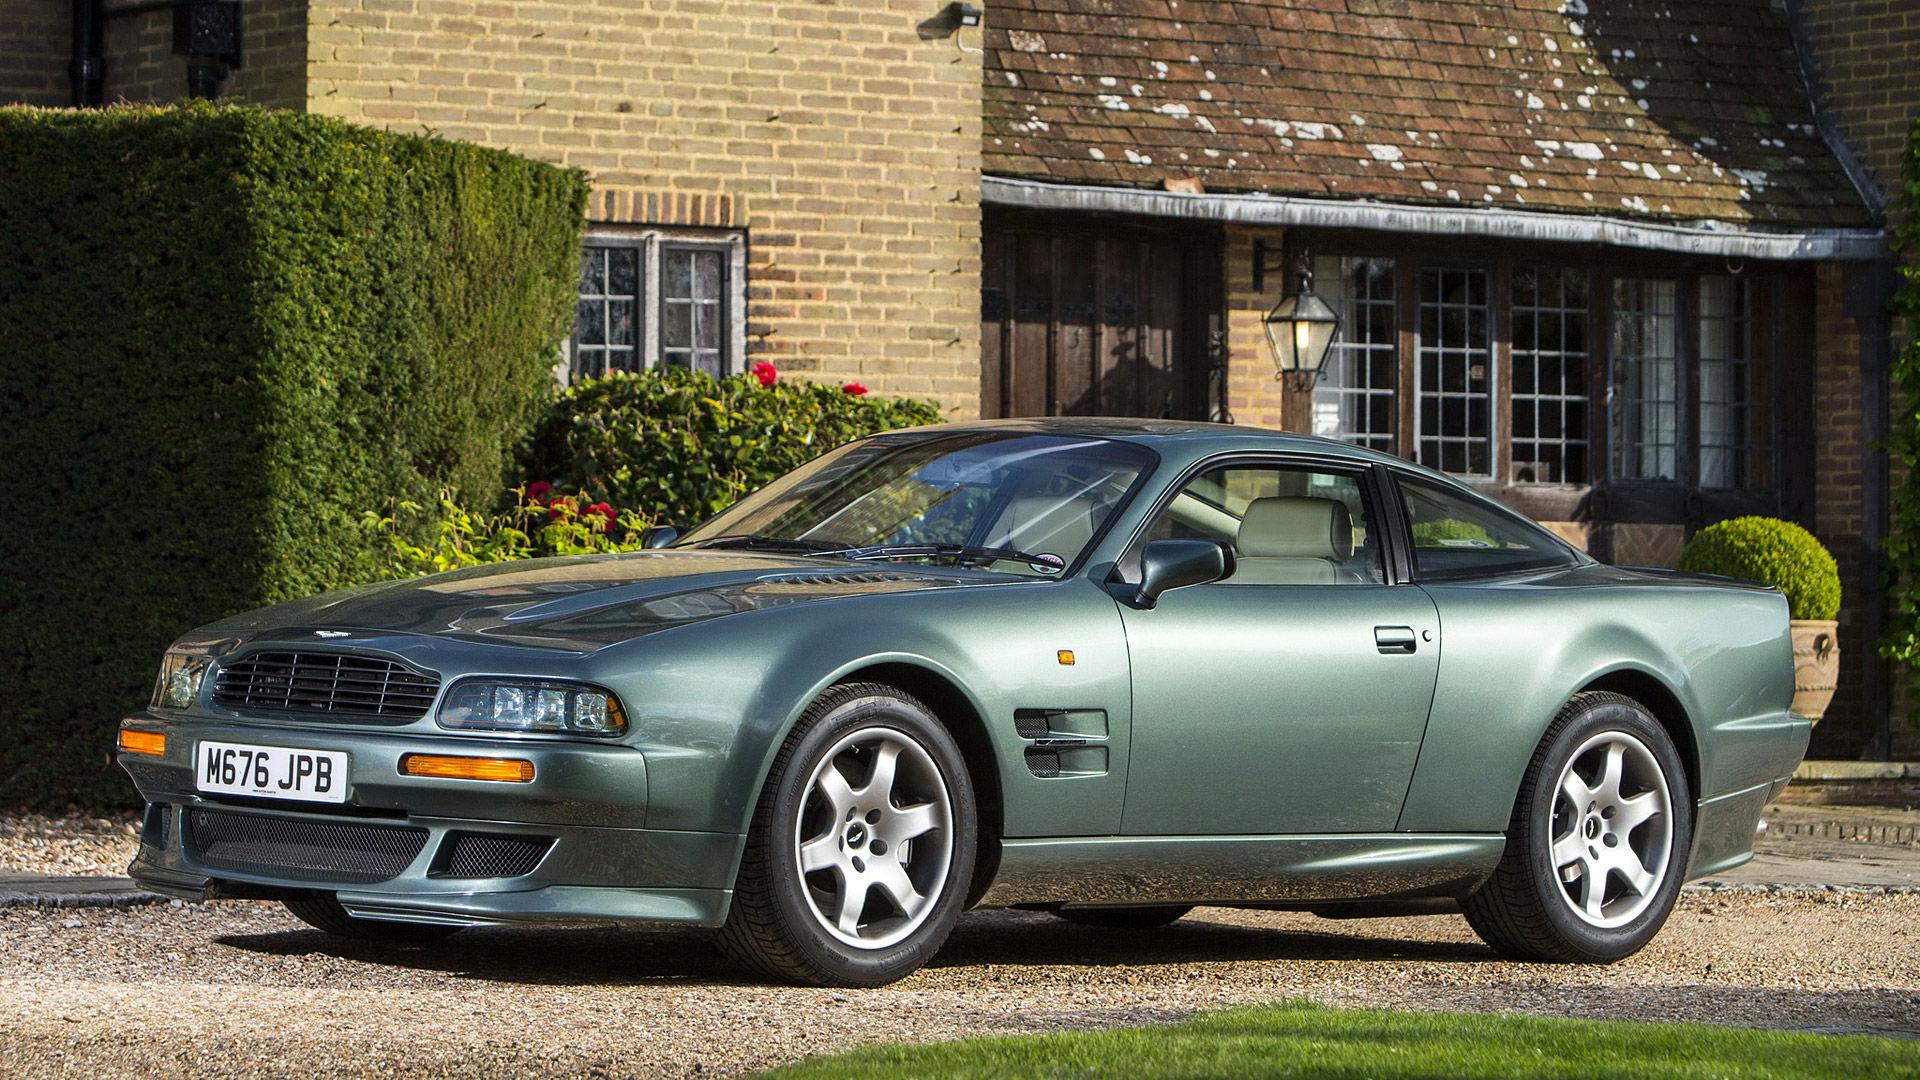 1993 Aston Martin V8 Vantage